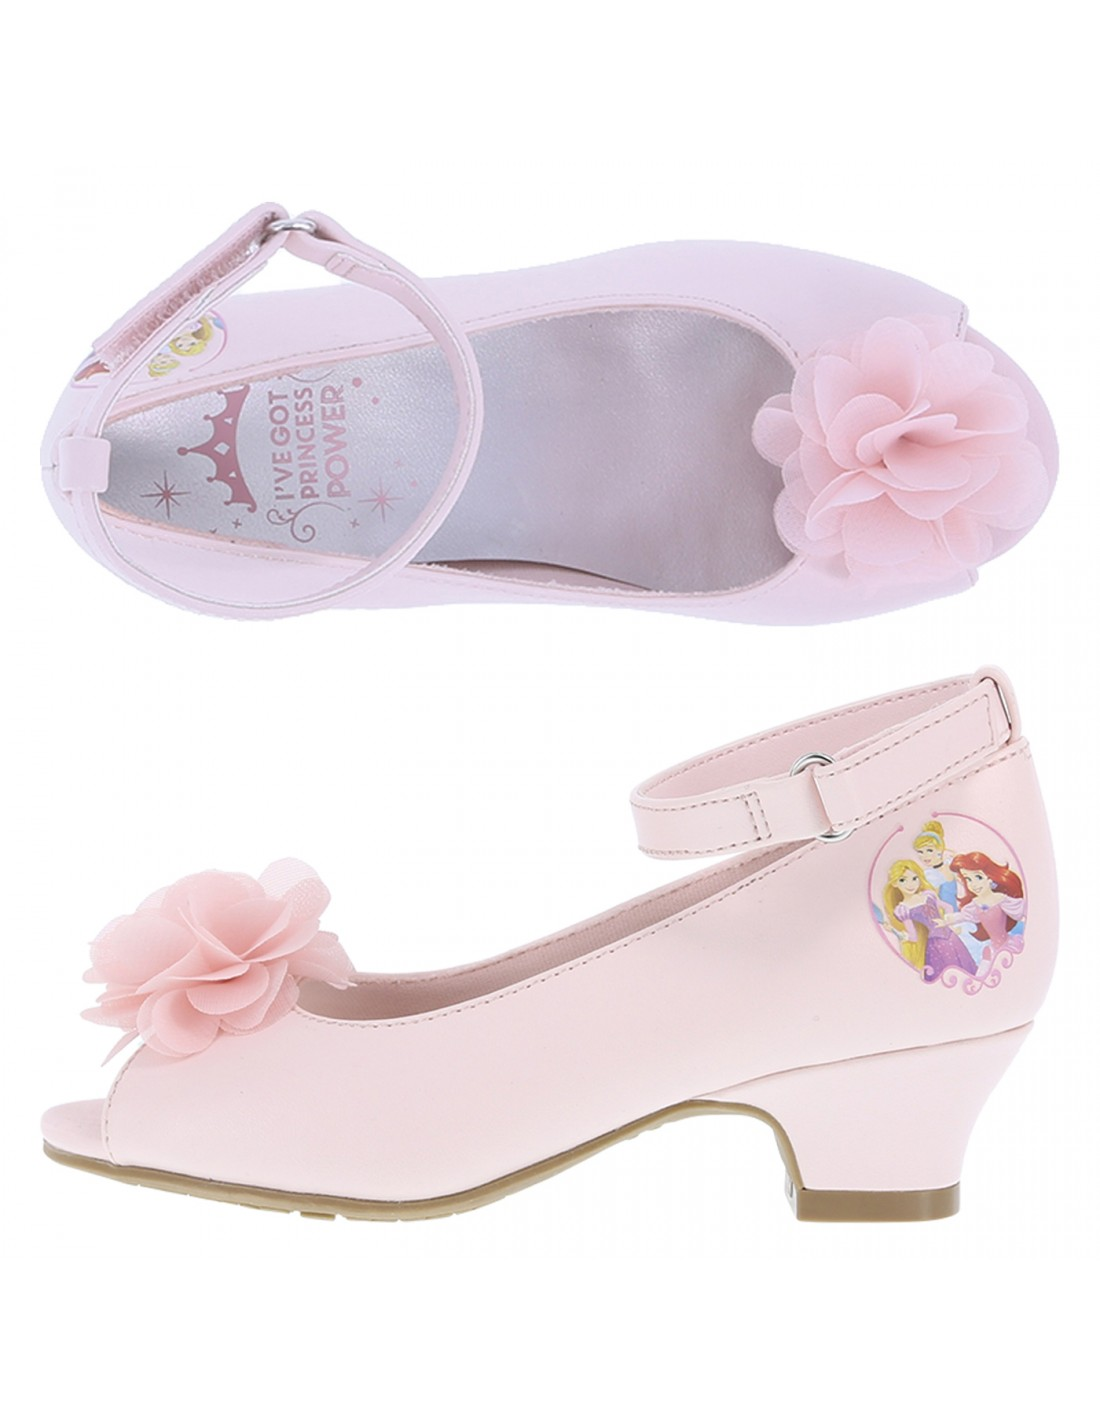 Disney Princess Peep Toe Girls Toddler Flower Heels Payless